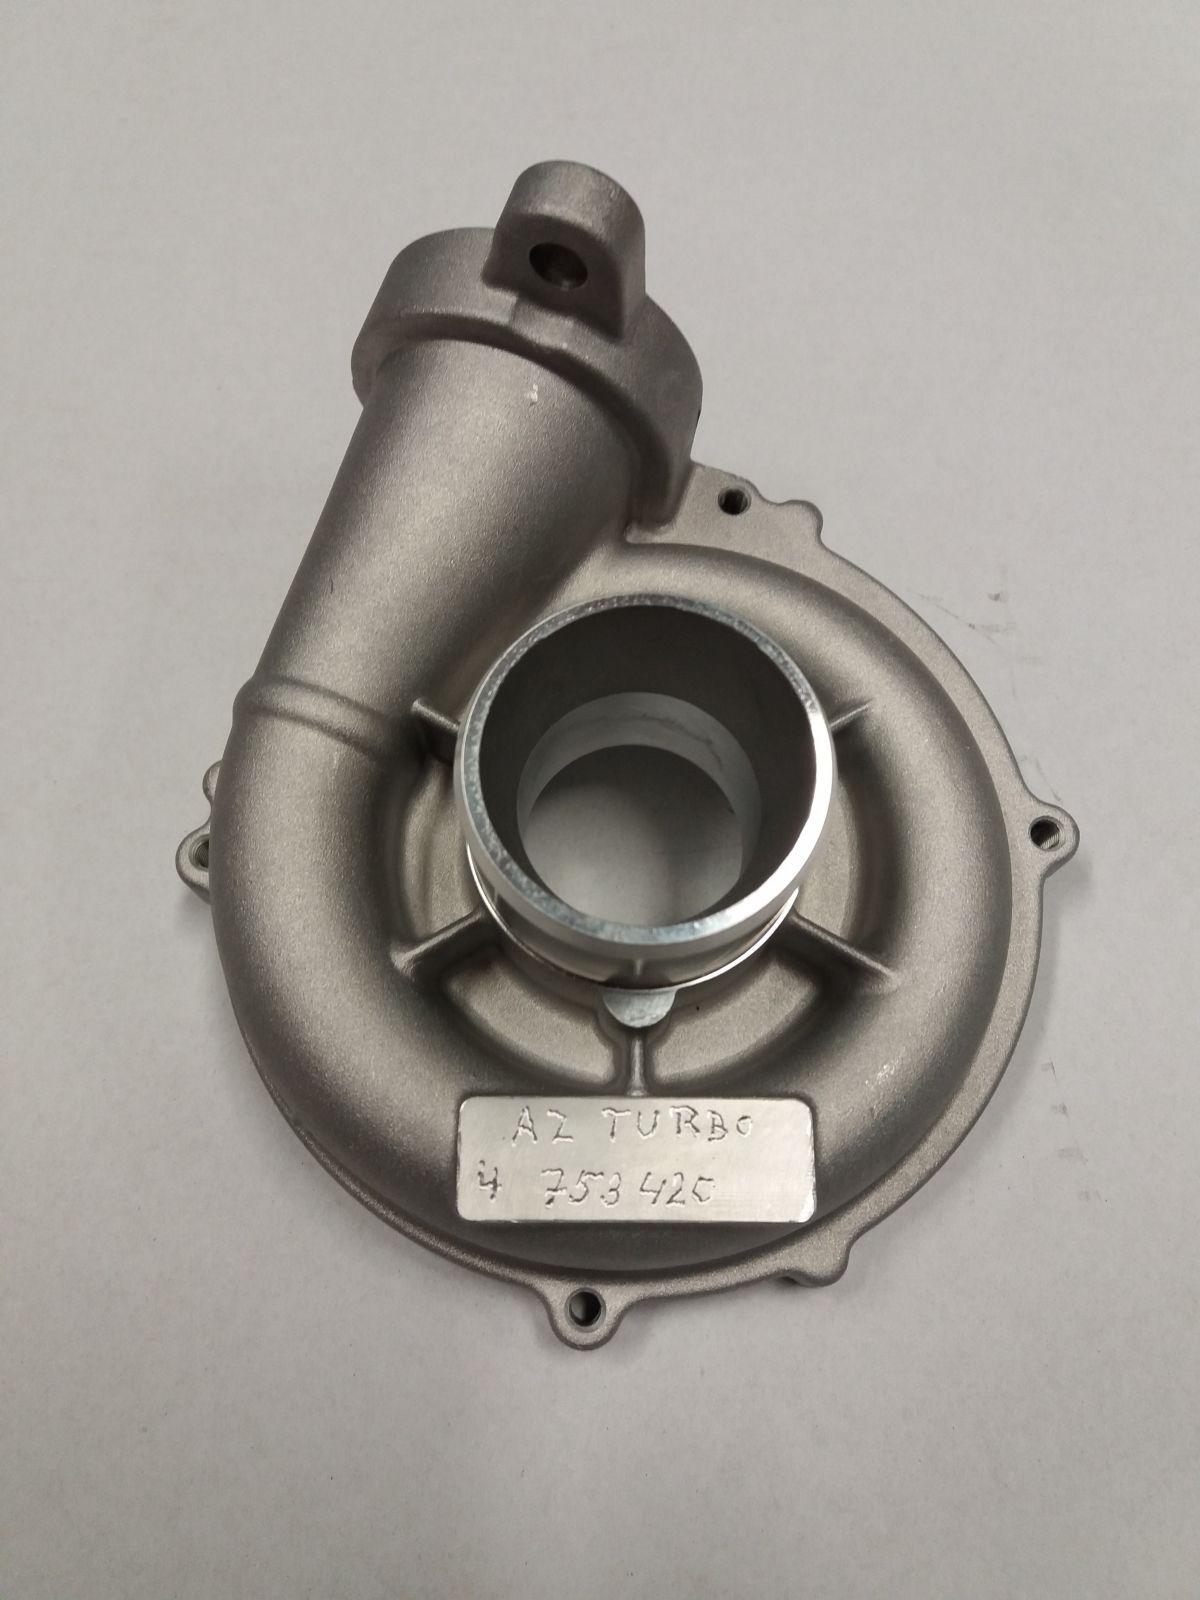 Sací komora turbodmychadla Citroen C5 1,6HDi, 80kW, r.v. 03-, Motor: DV6TED4 GARRETT